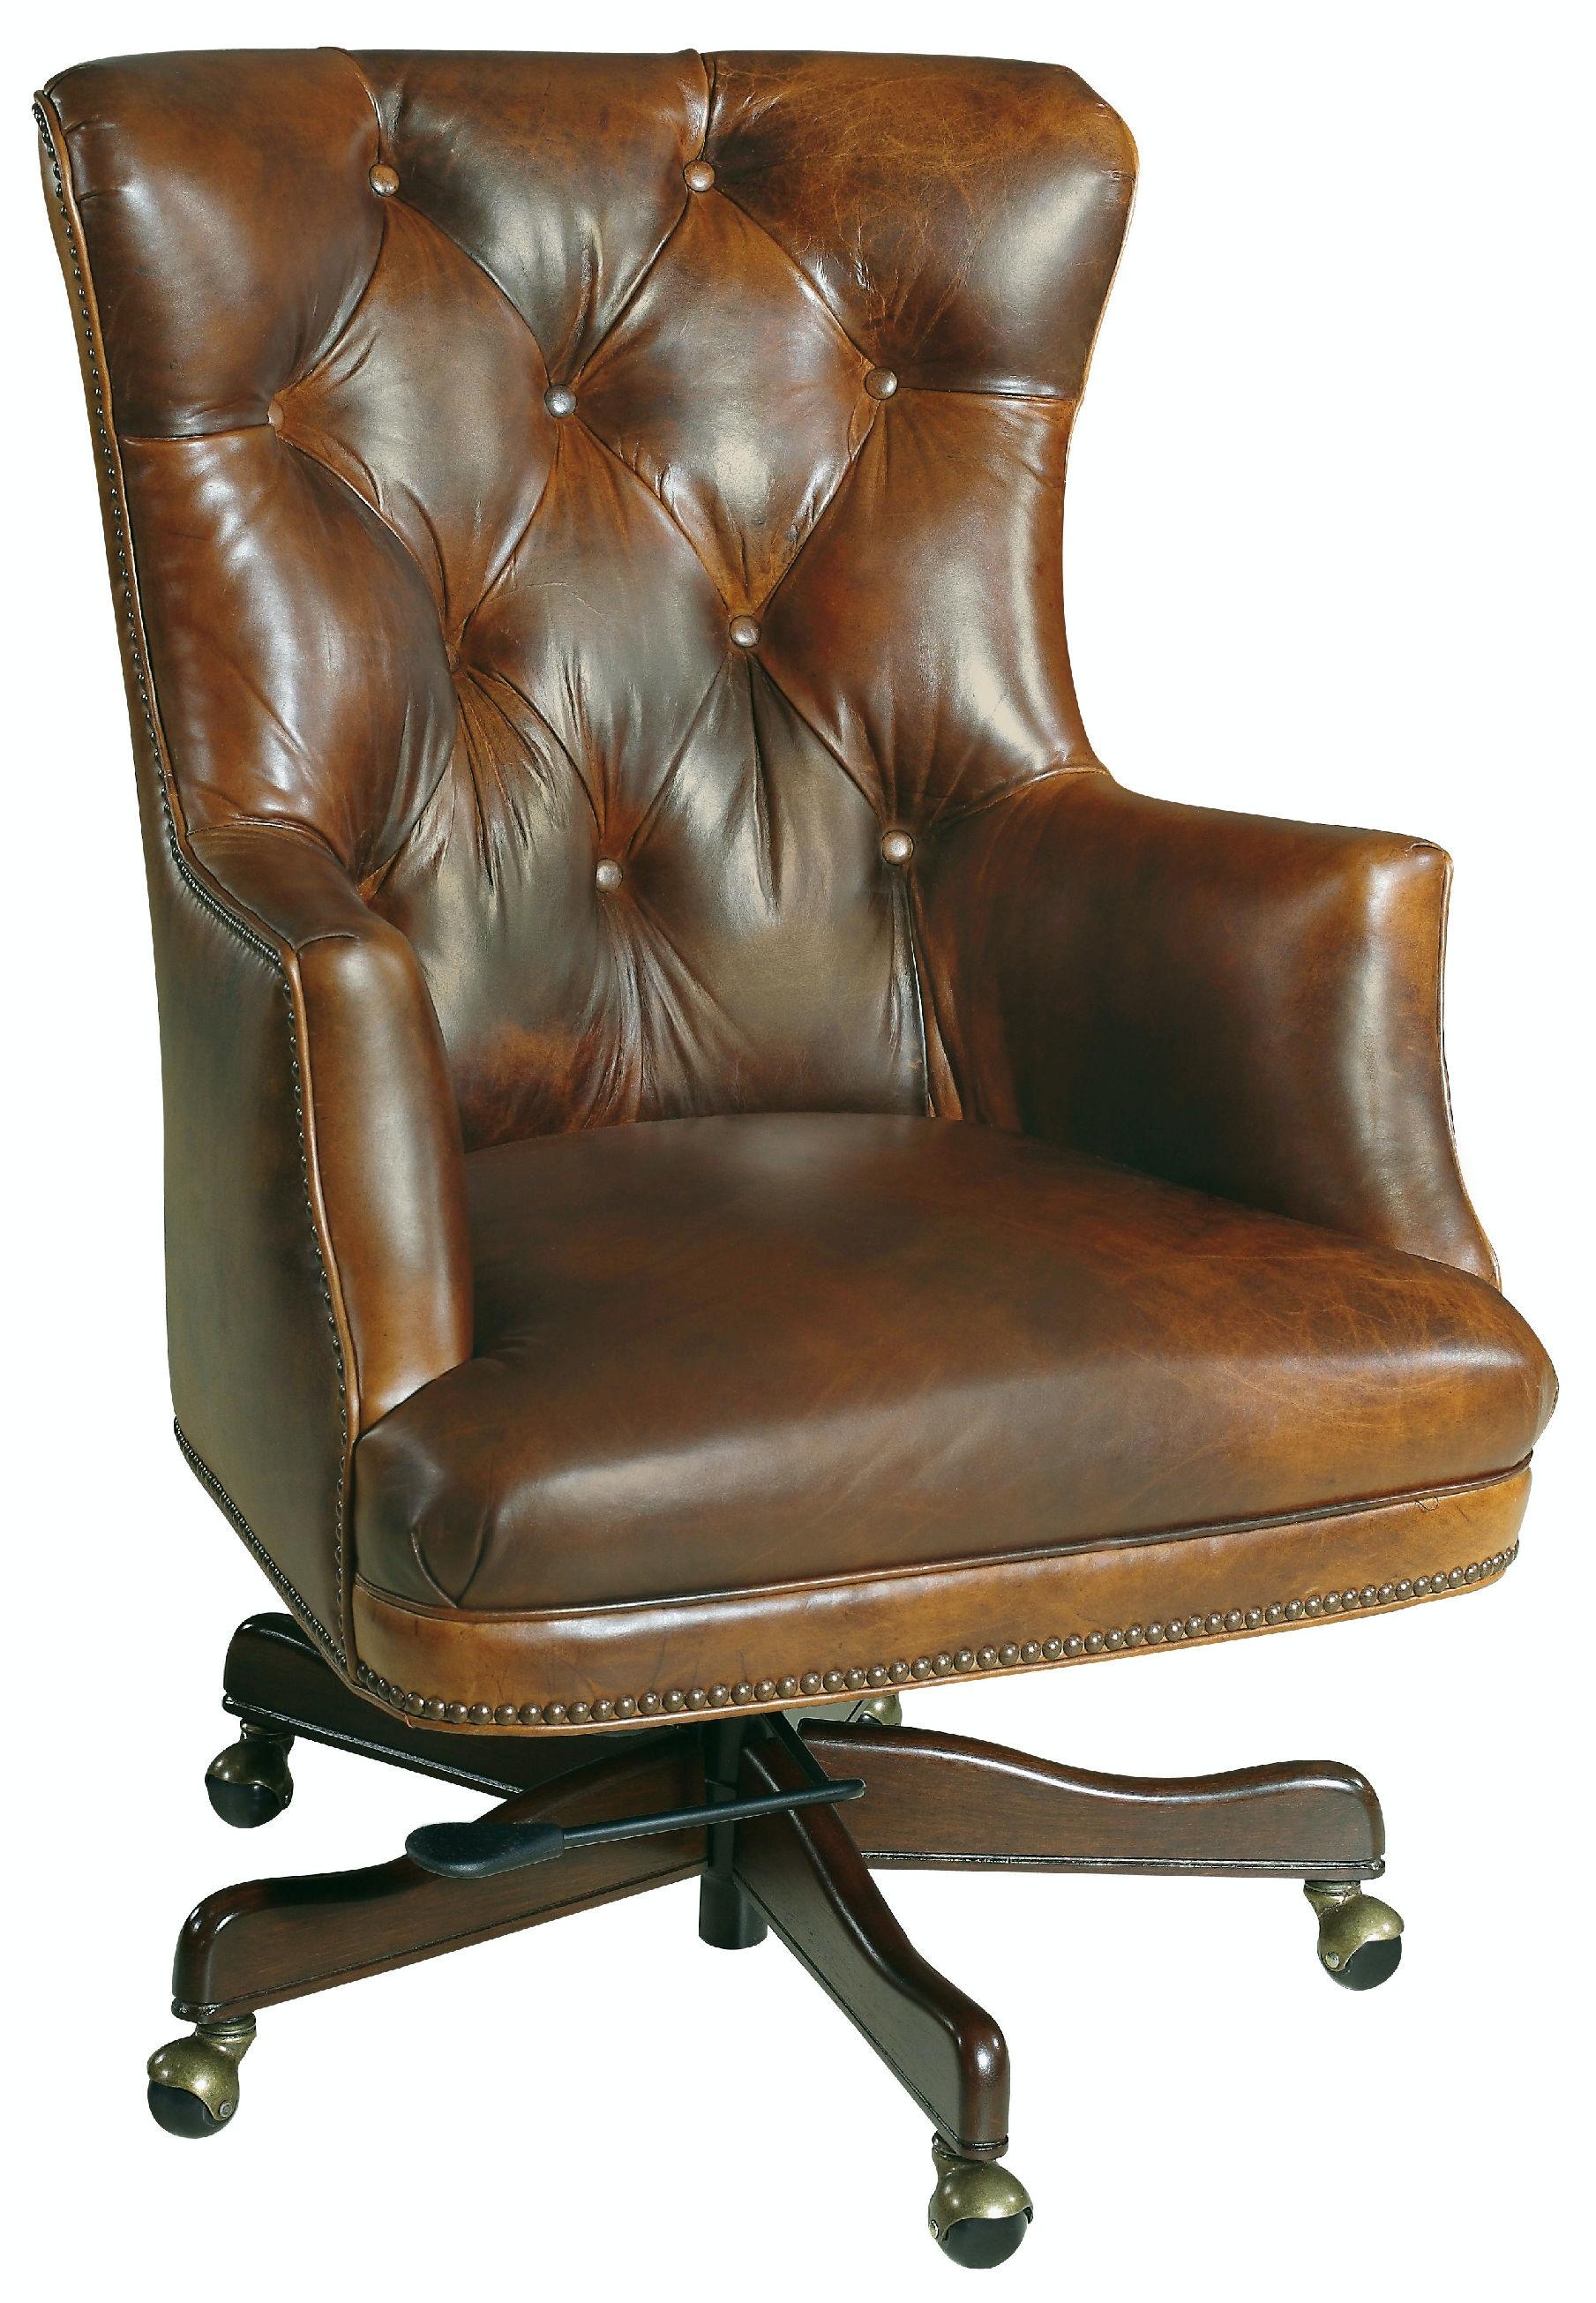 Hooker Furniture Bradley Executive Swivel Tilt Chair EC436 087